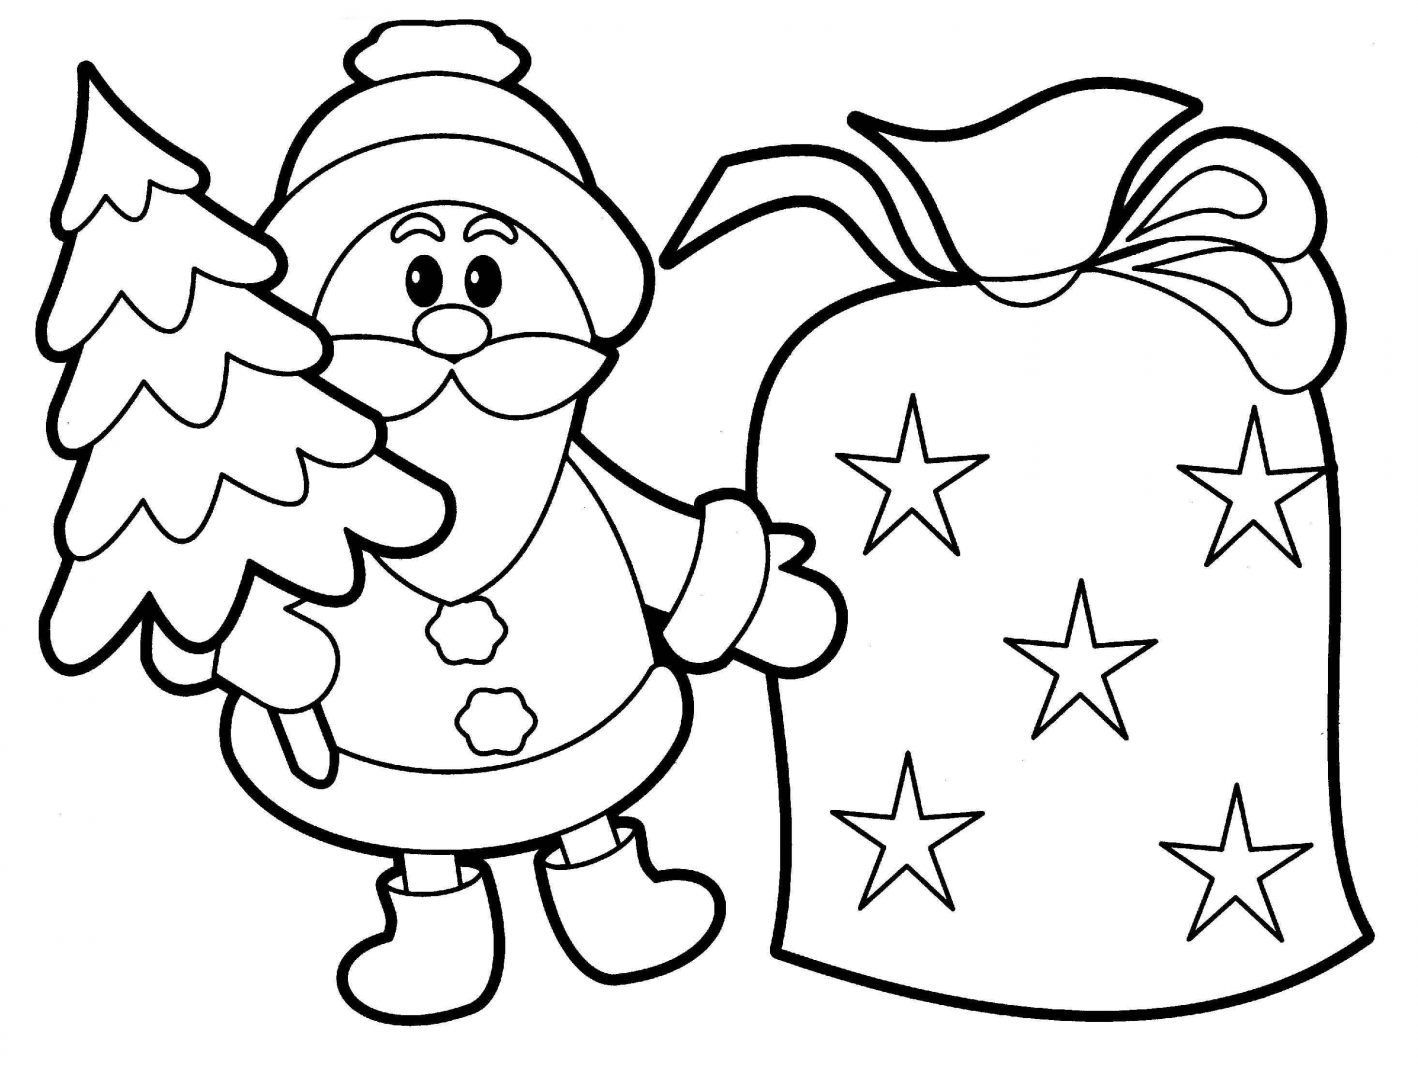 Dibujos para pintar imprimir gratis de navidad